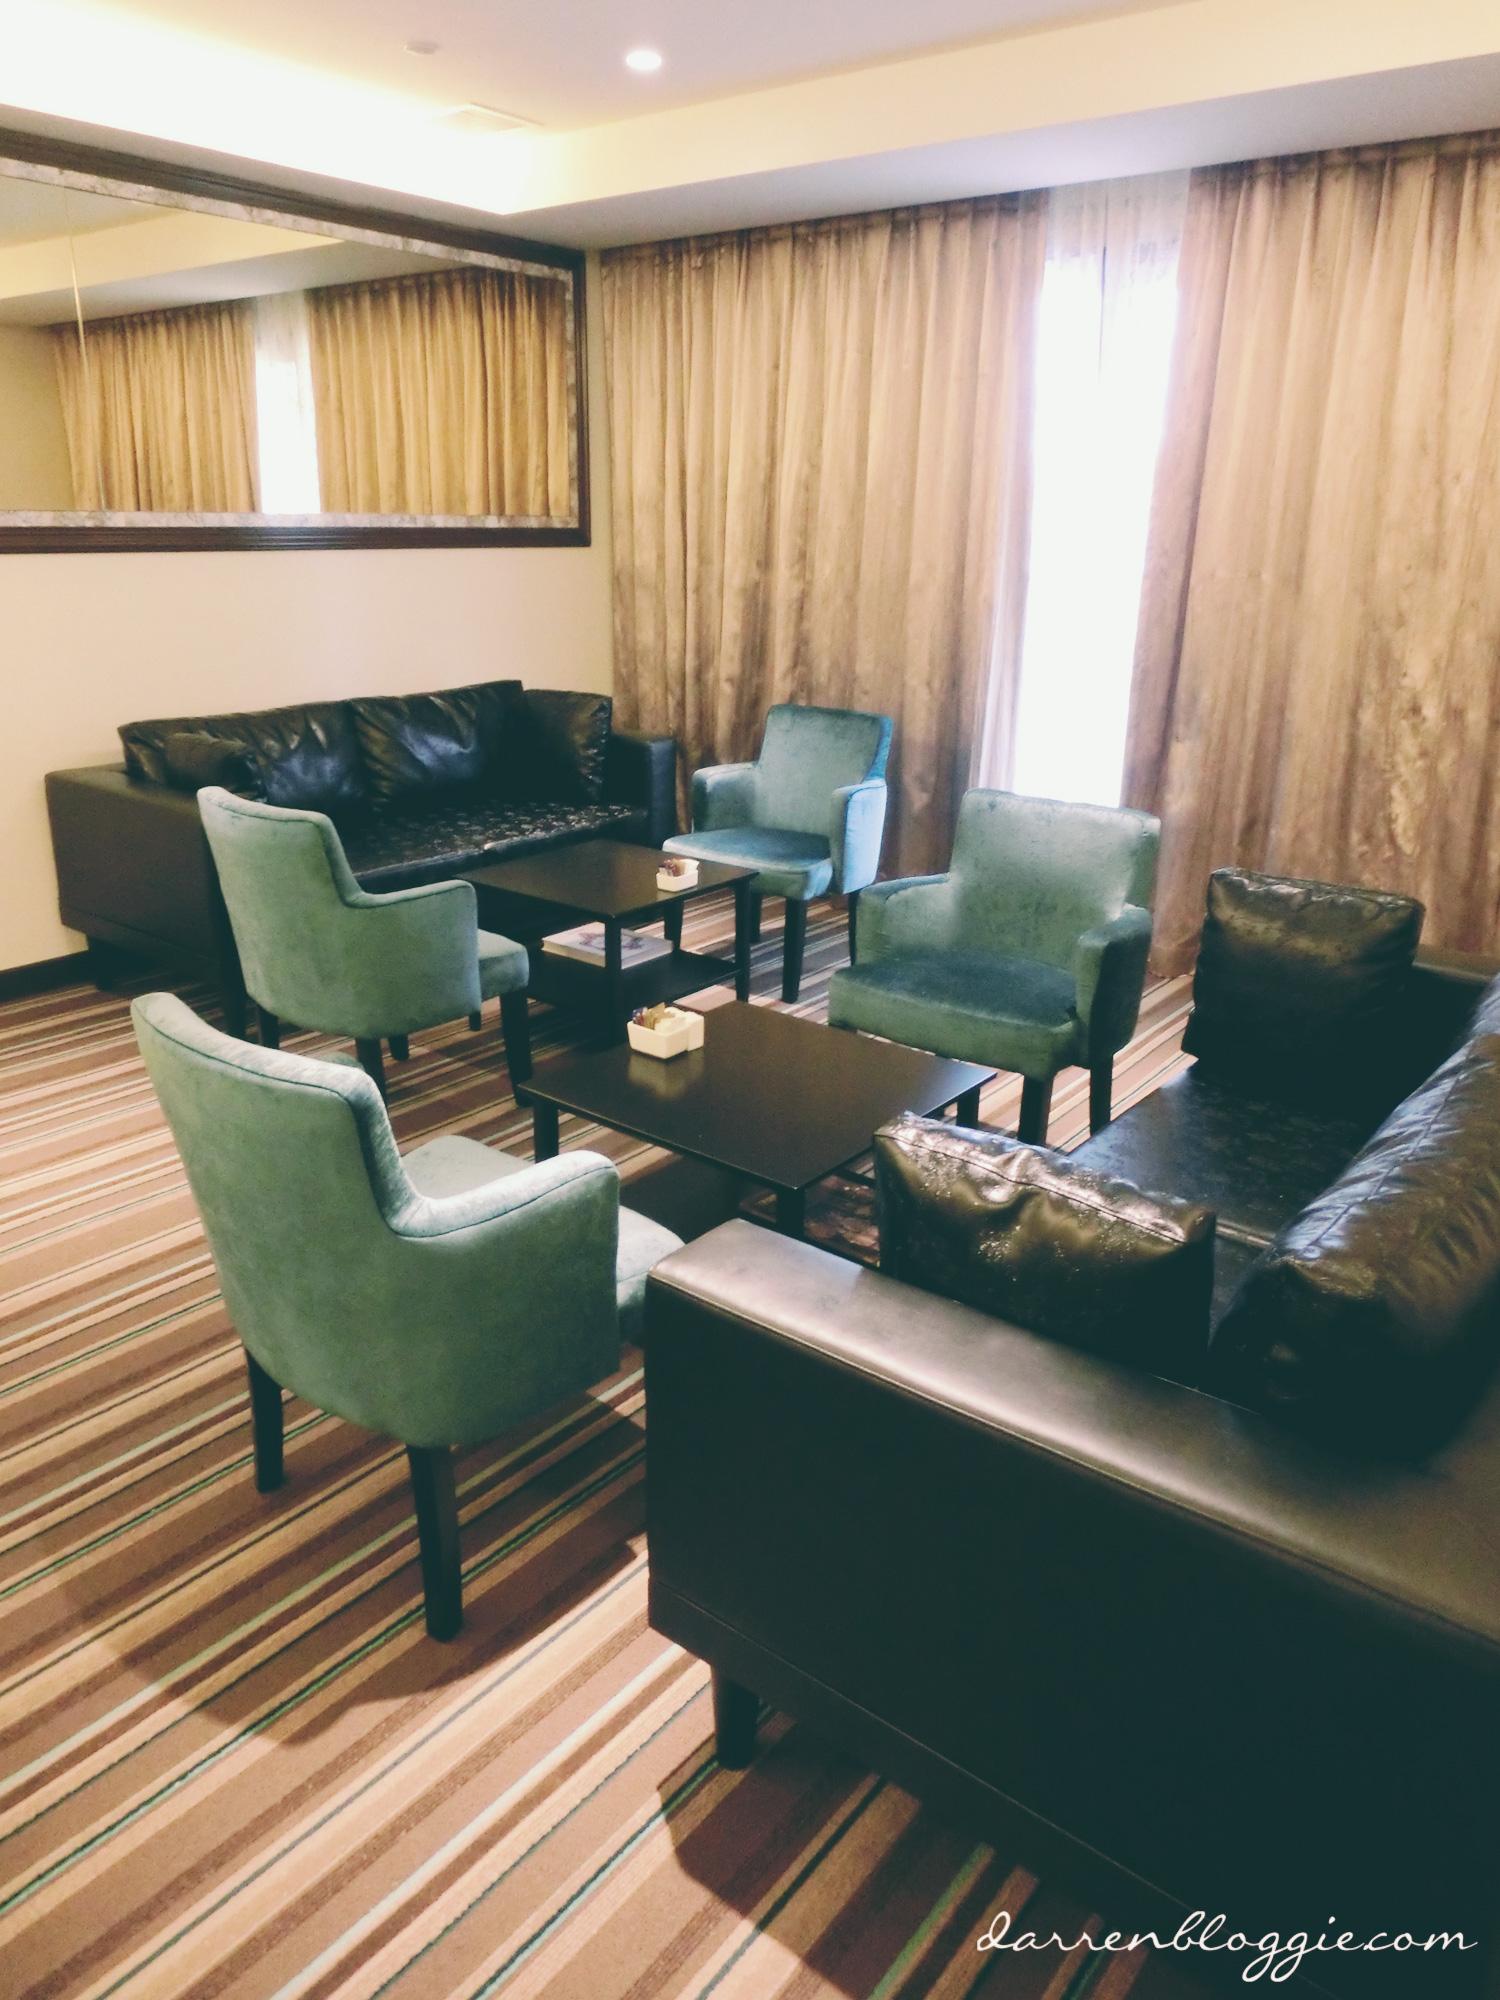 Village Hotel Katong Staycation